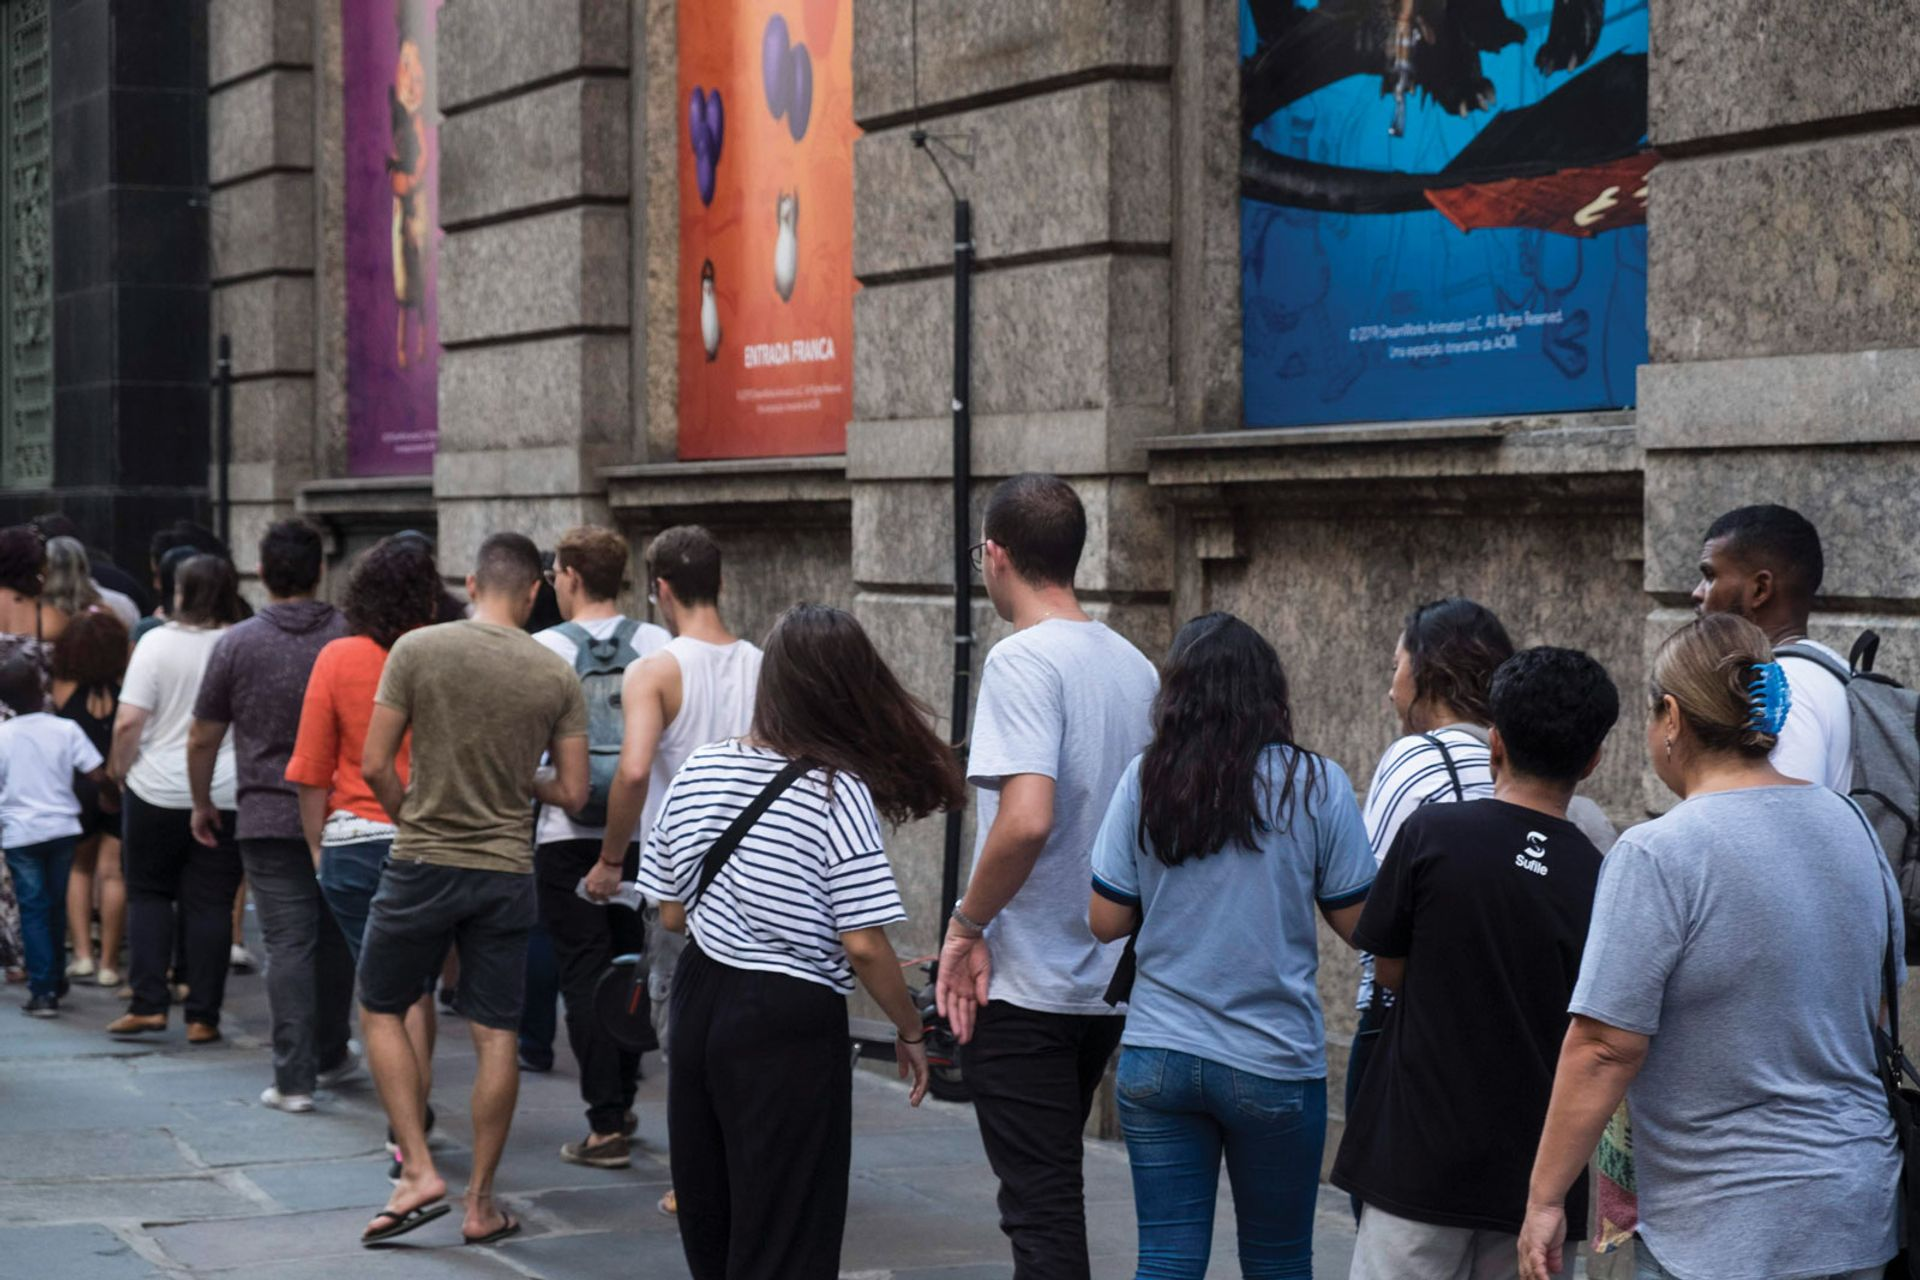 People queuing to get into the DreamWorks exhibition at Centro Cultural Banco do Brasil in Rio de Janeiro © CCBB